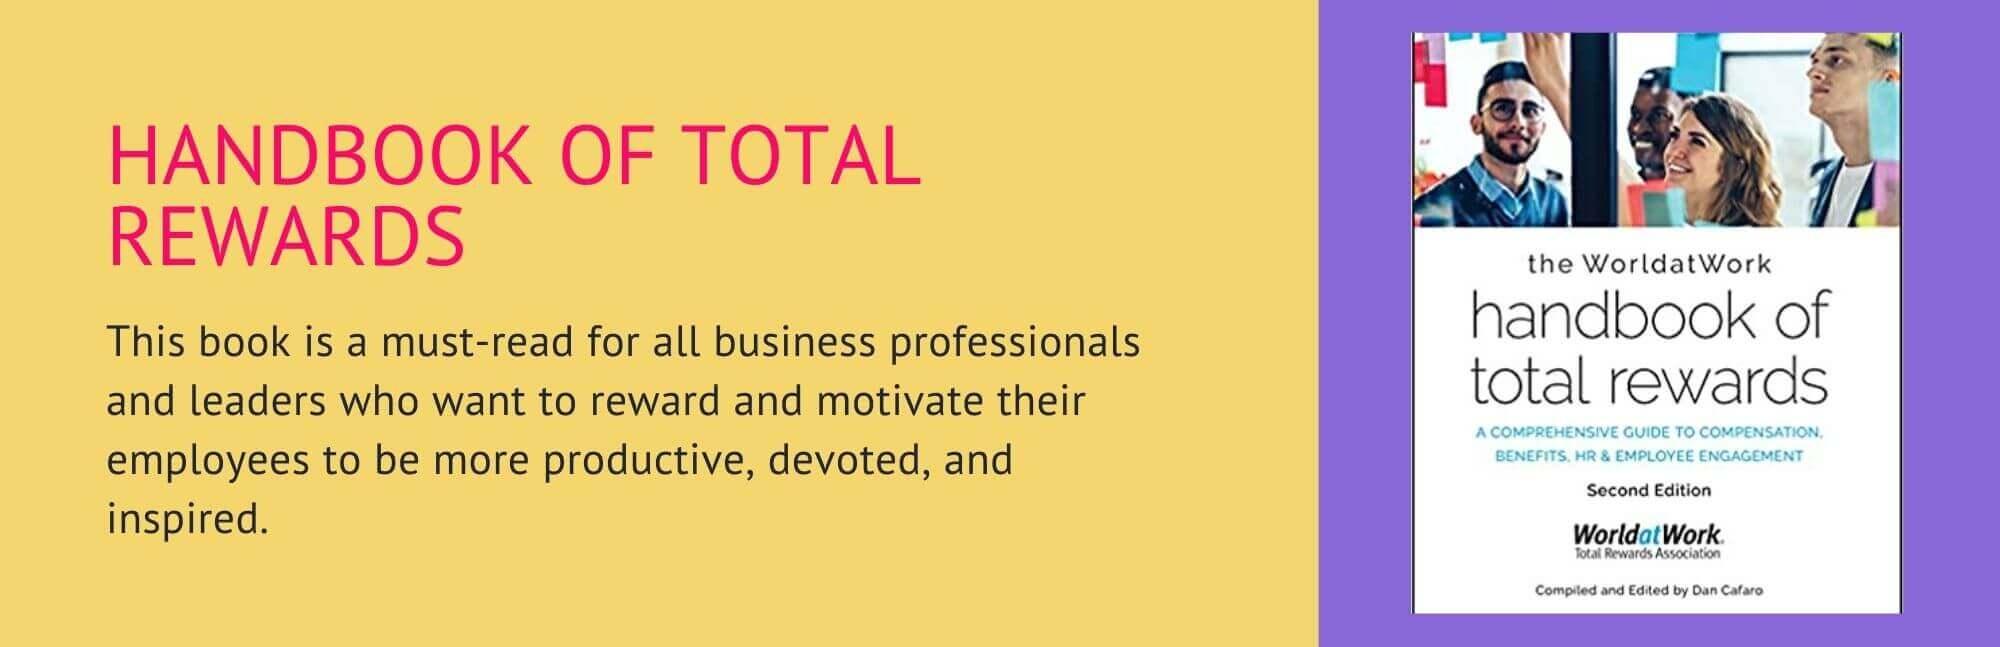 World-at-Work-total-rewards-book-1